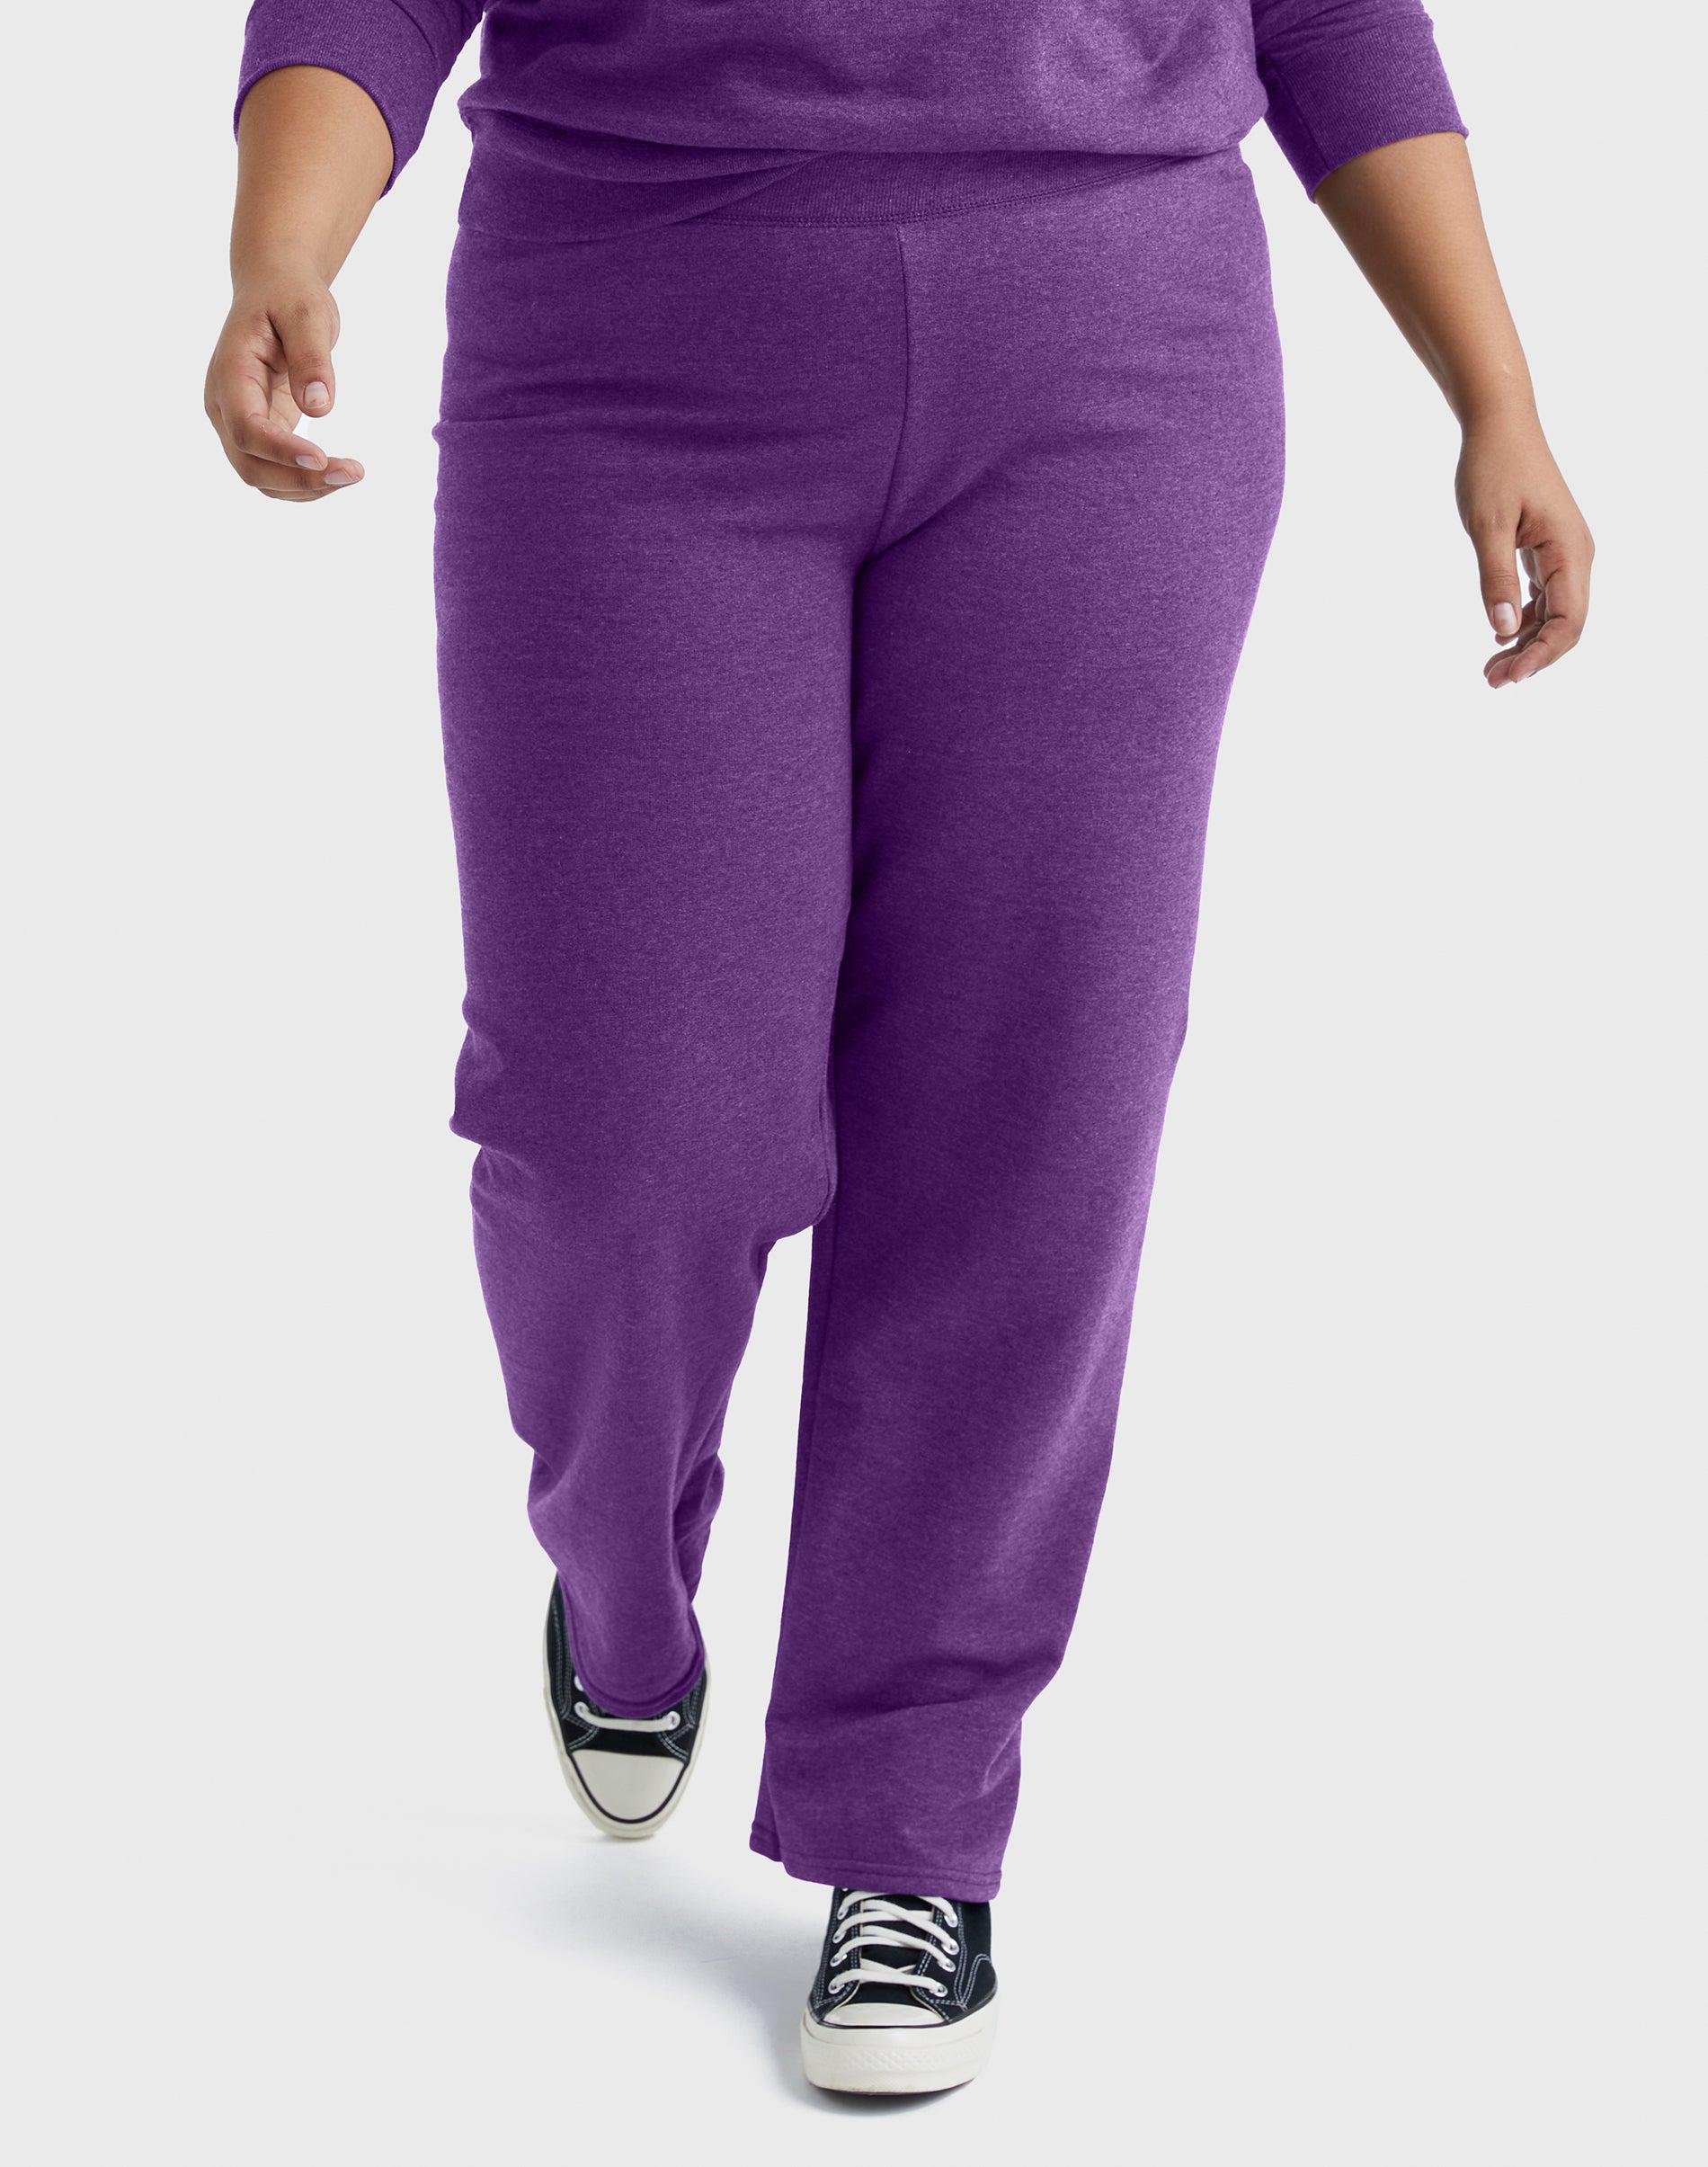 NWT  JUST MY SIZE 4X Sweat Pants Cotton Rich Fleece Lined  Cornflower Blue